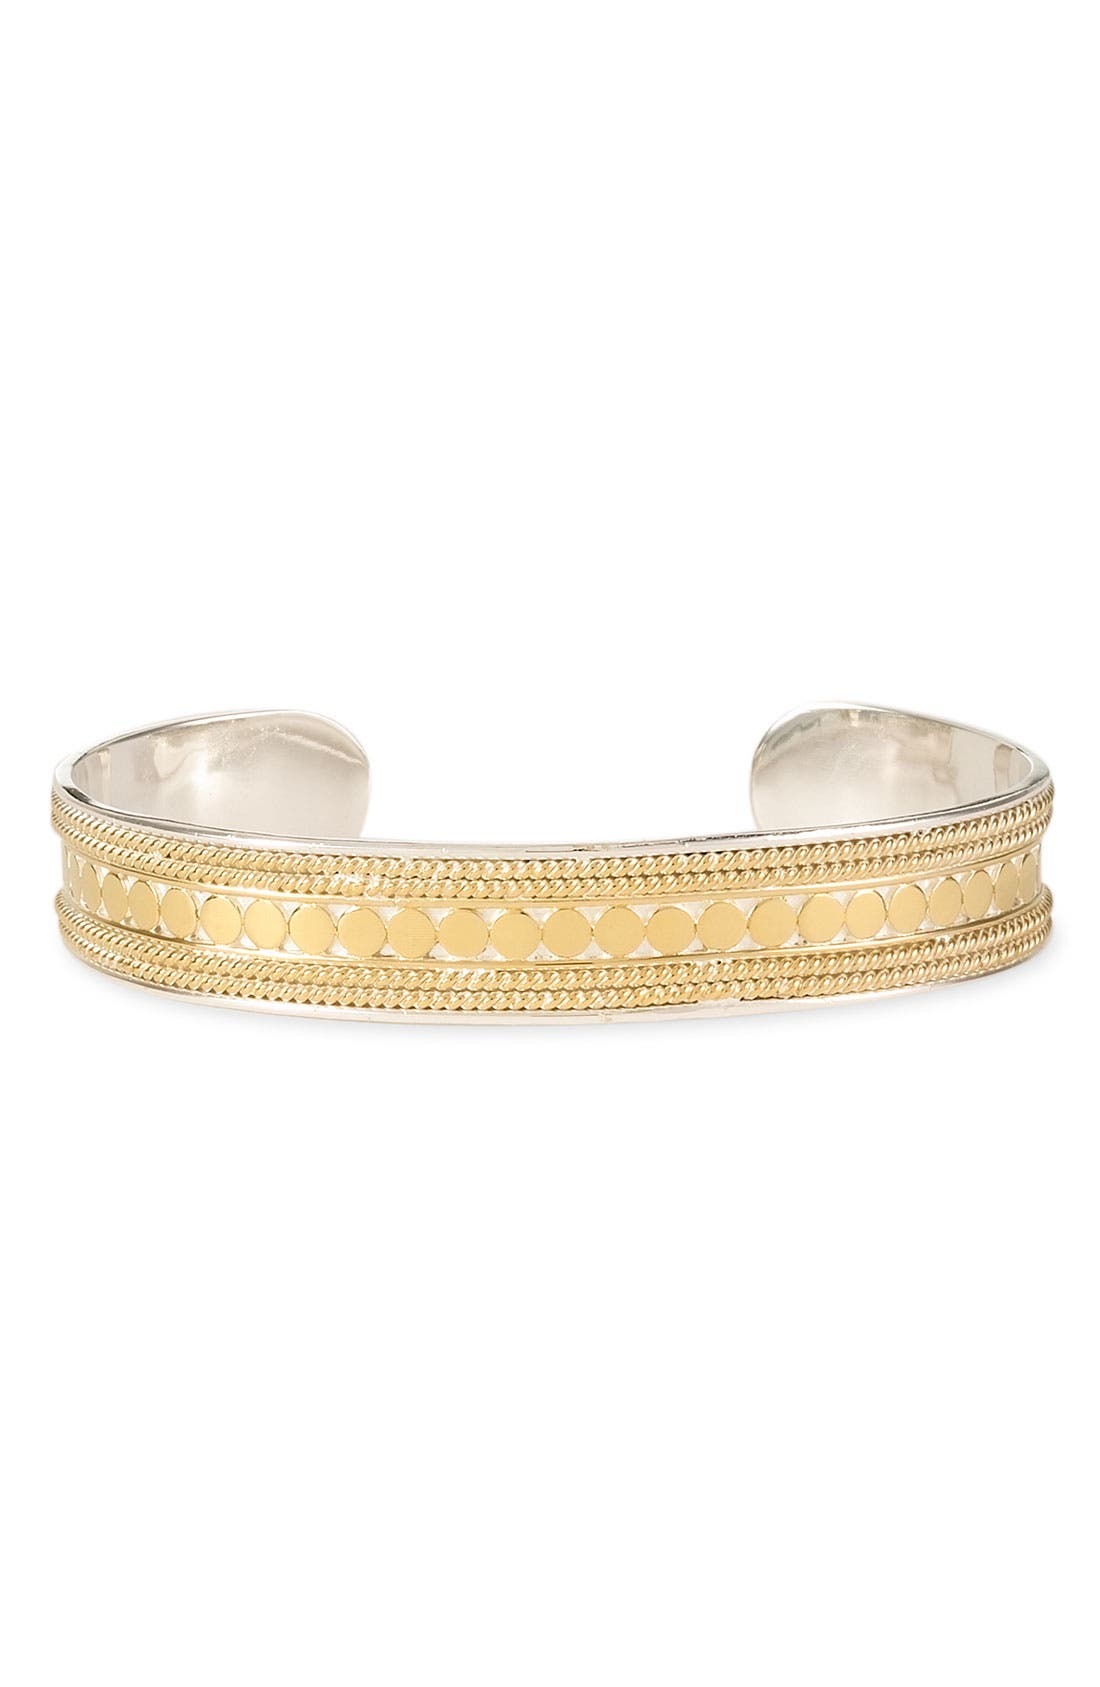 'Gili' Skinny Cuff Bracelet,                             Main thumbnail 1, color,                             711